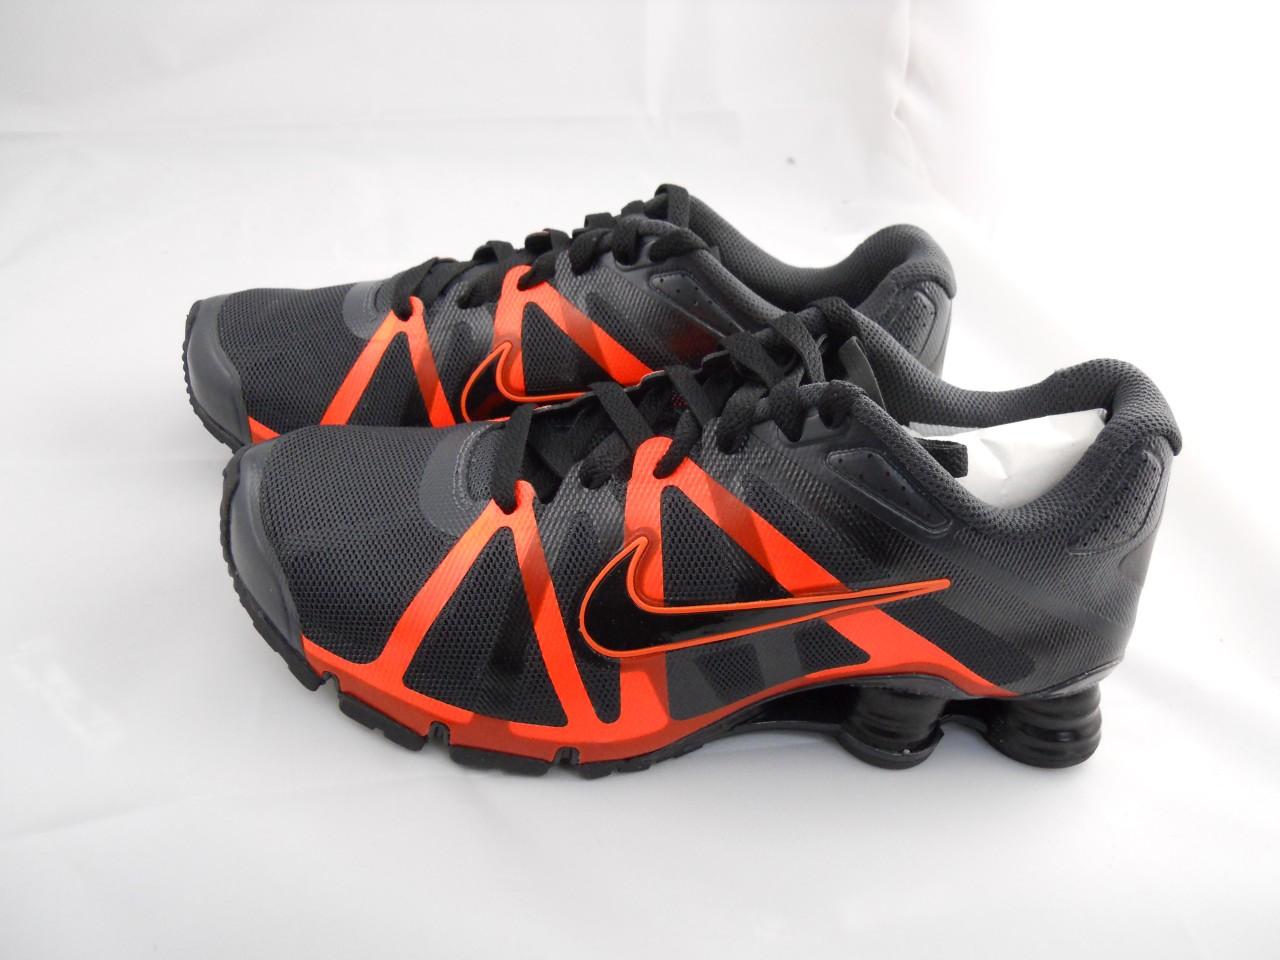 683a0f9a29f New Mens Nike Shox Roadster 487604 008 Anthracite Black Total Orange